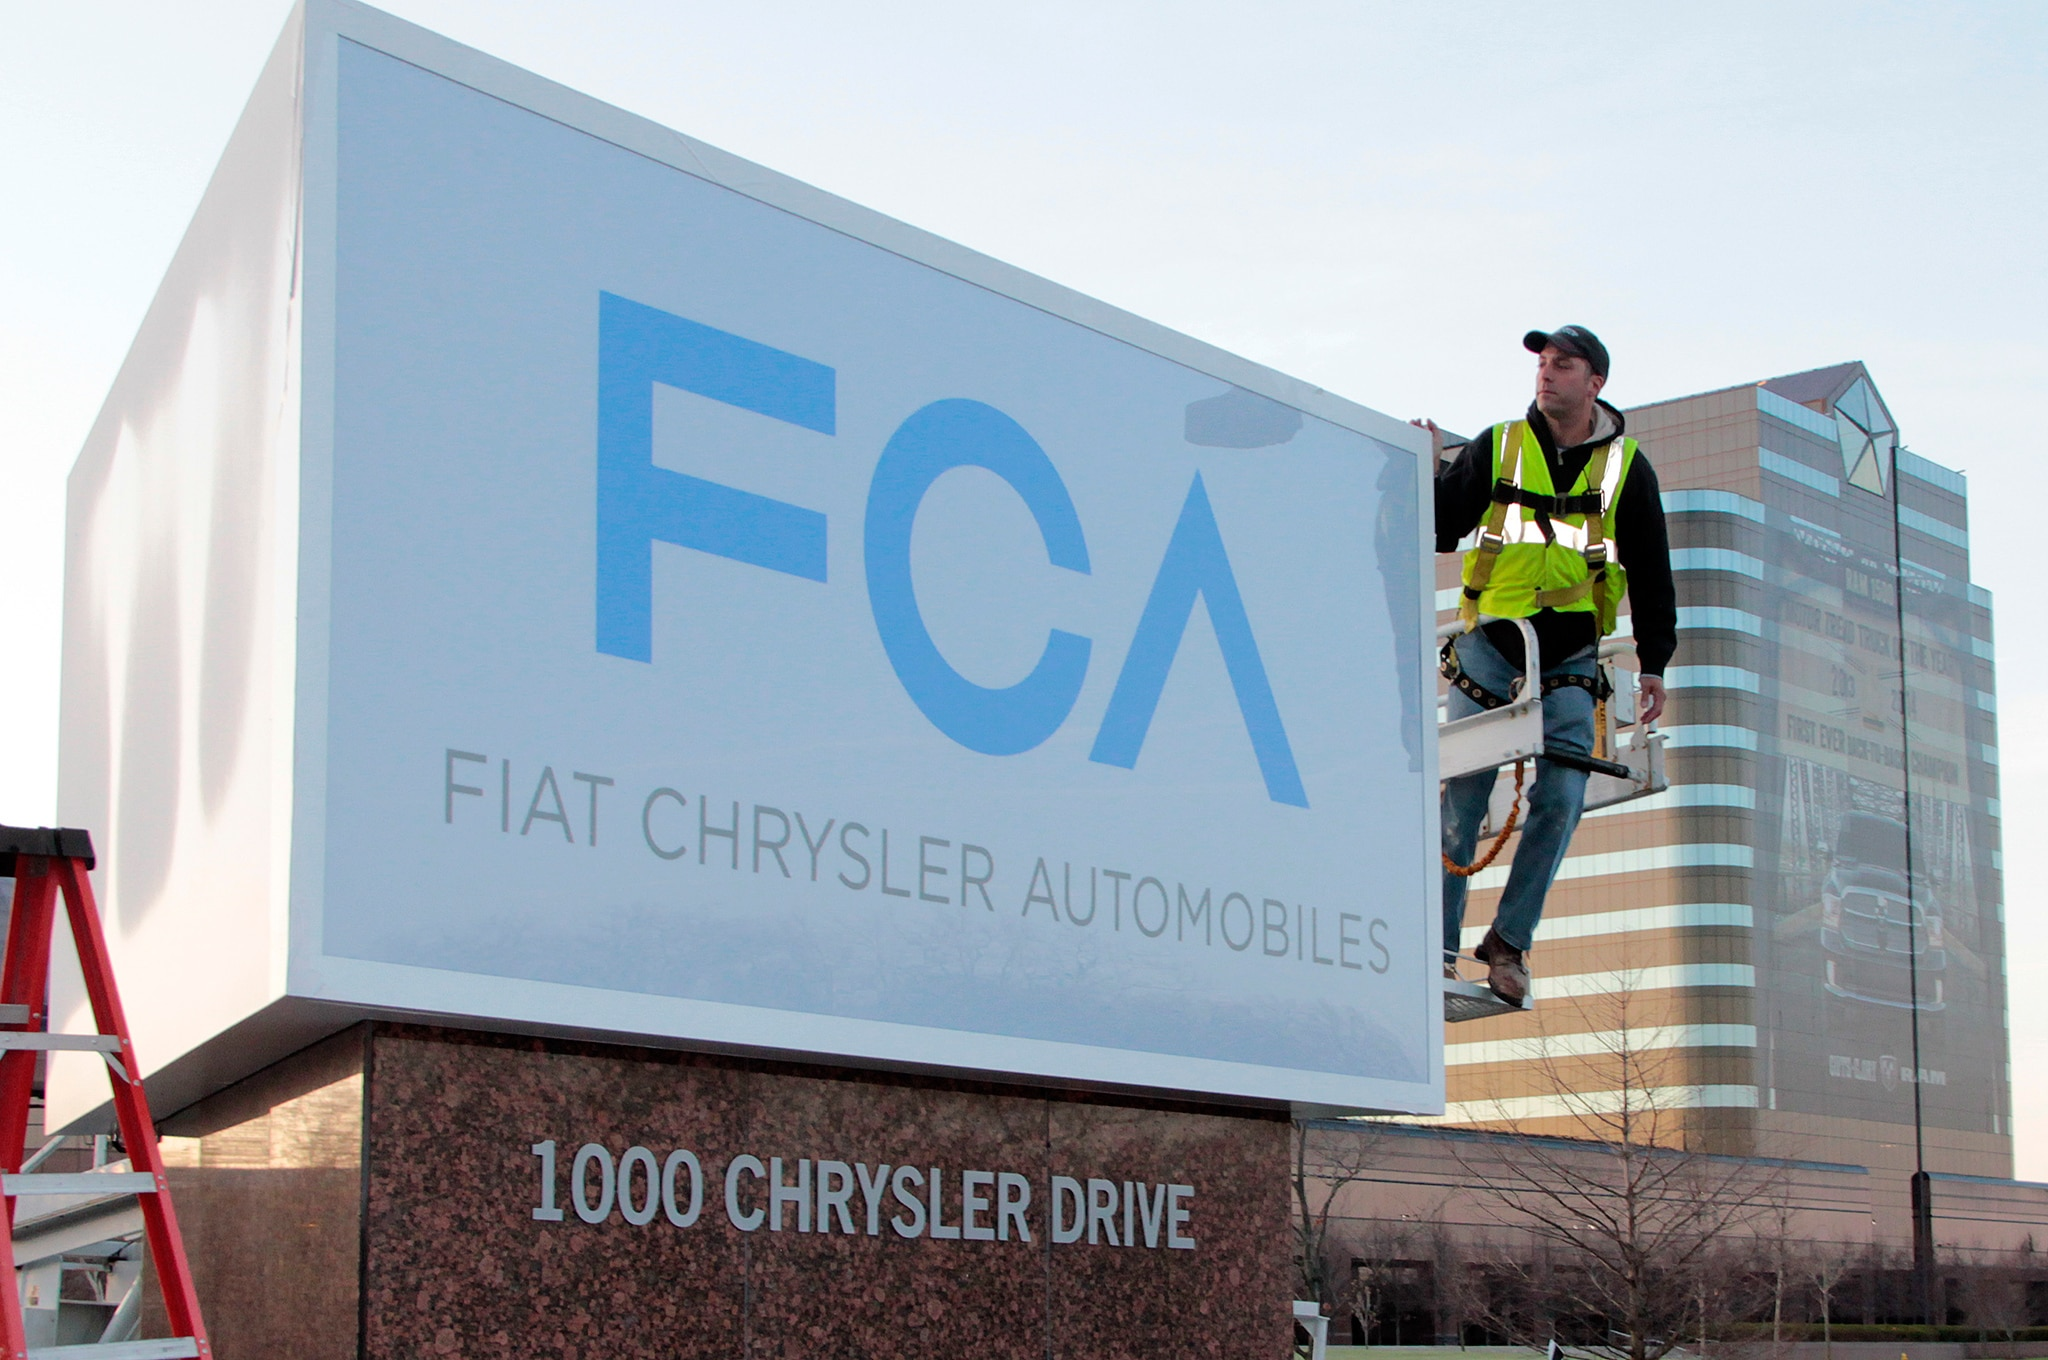 Fiat Chrysler Automobiles New Sign Construction 43